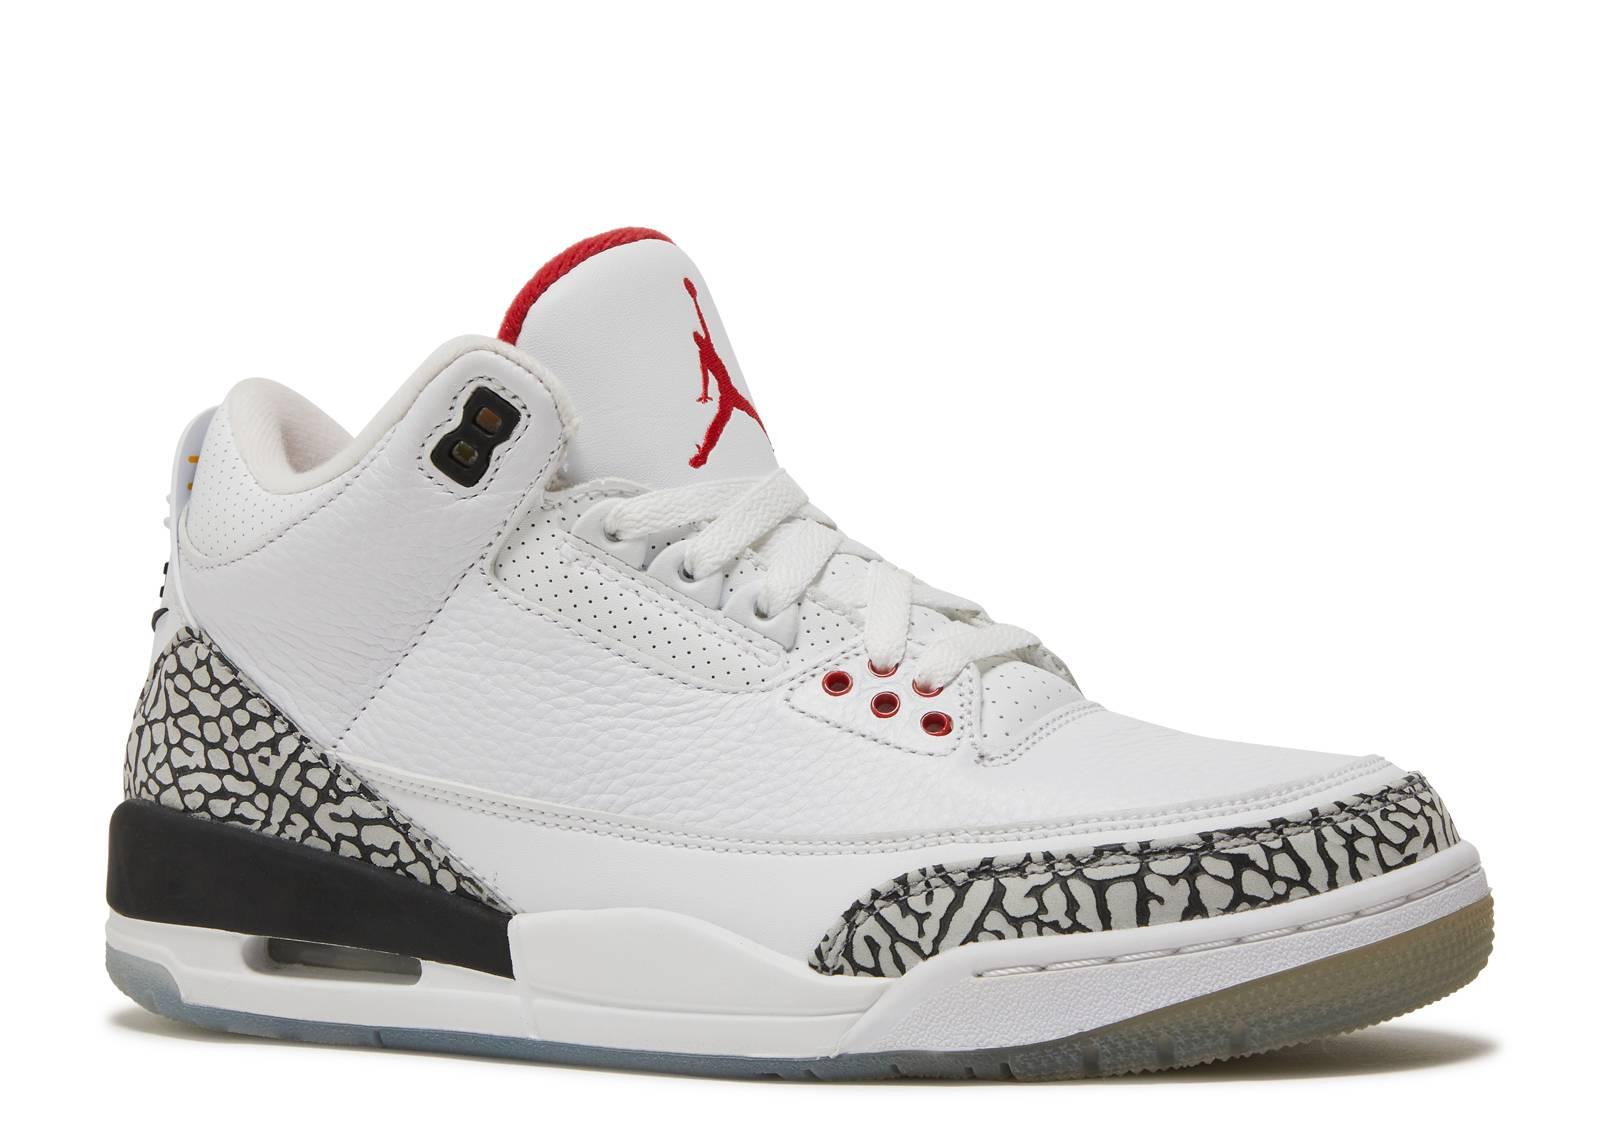 bd68f636834a Jordan 3 Retro Free Throw Line White Cement - 1